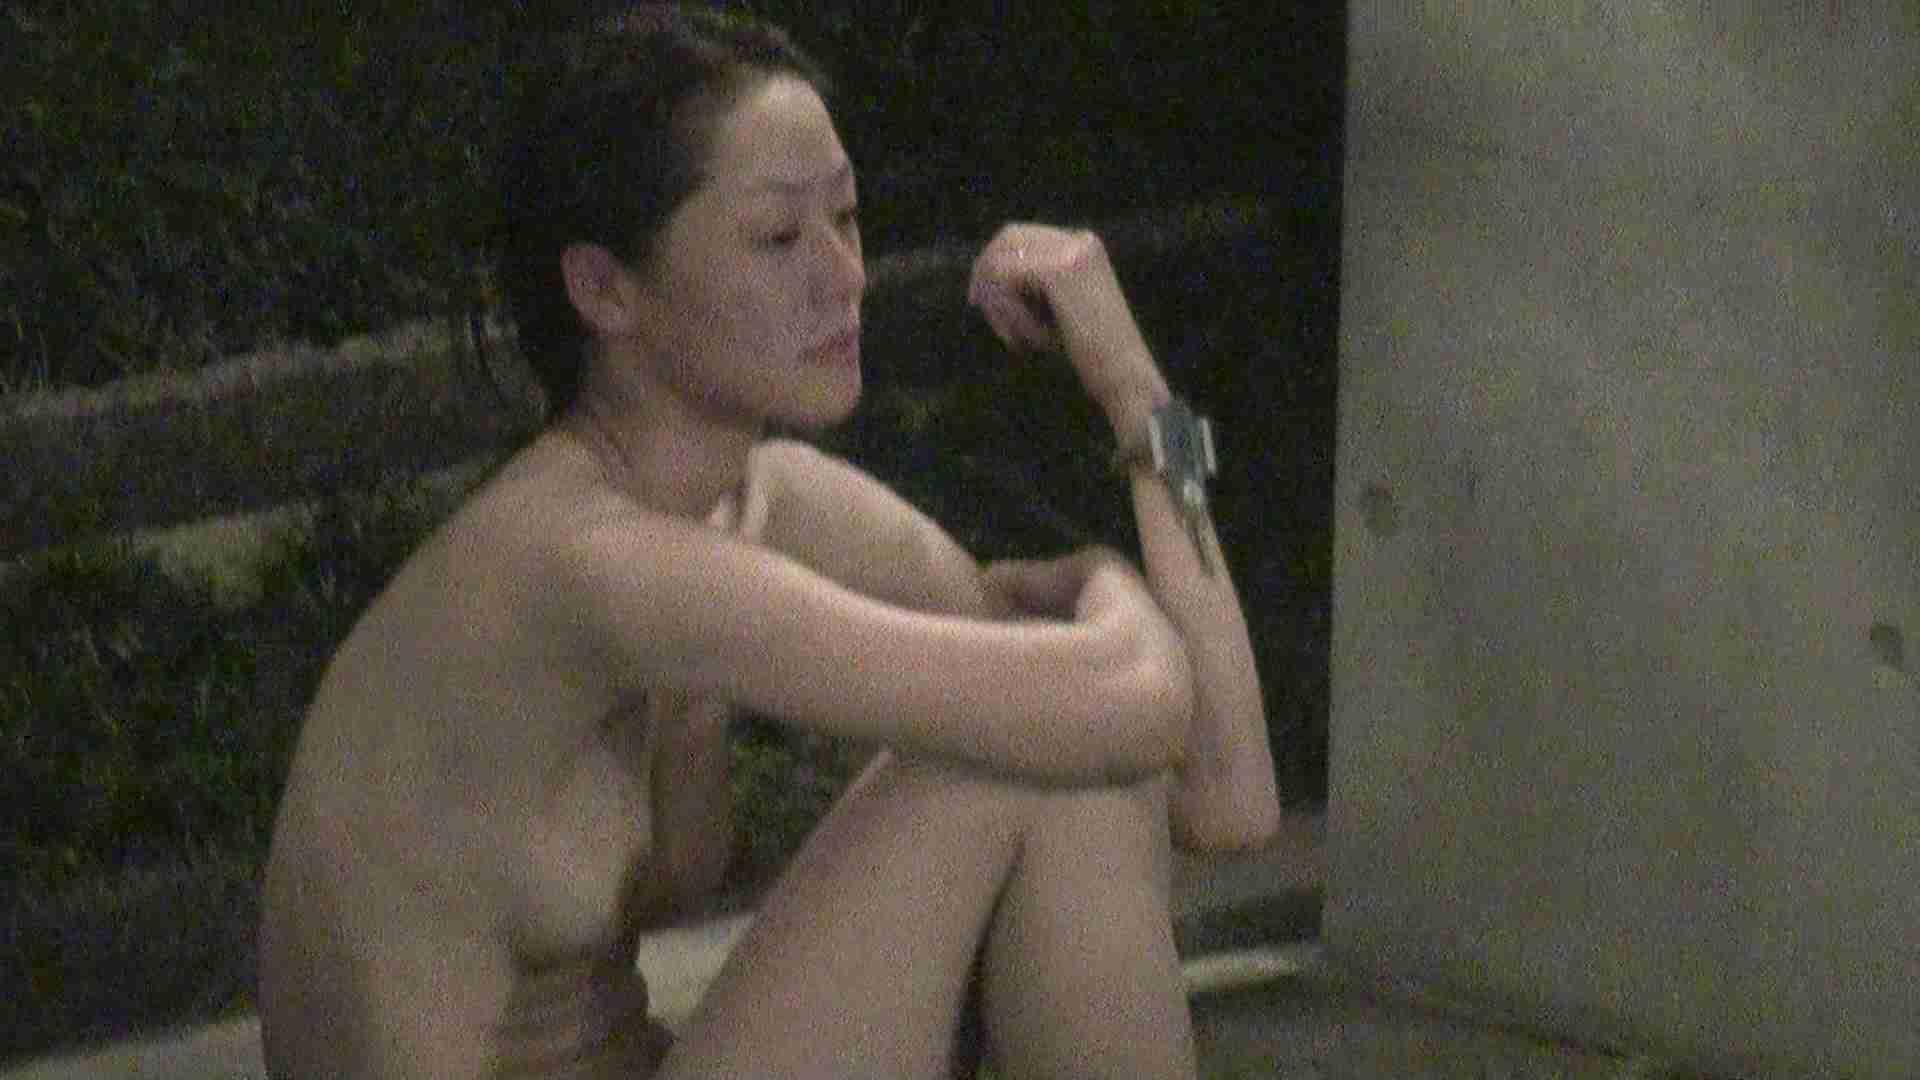 Aquaな露天風呂Vol.318 OLセックス 盗み撮りSEX無修正画像 48画像 35